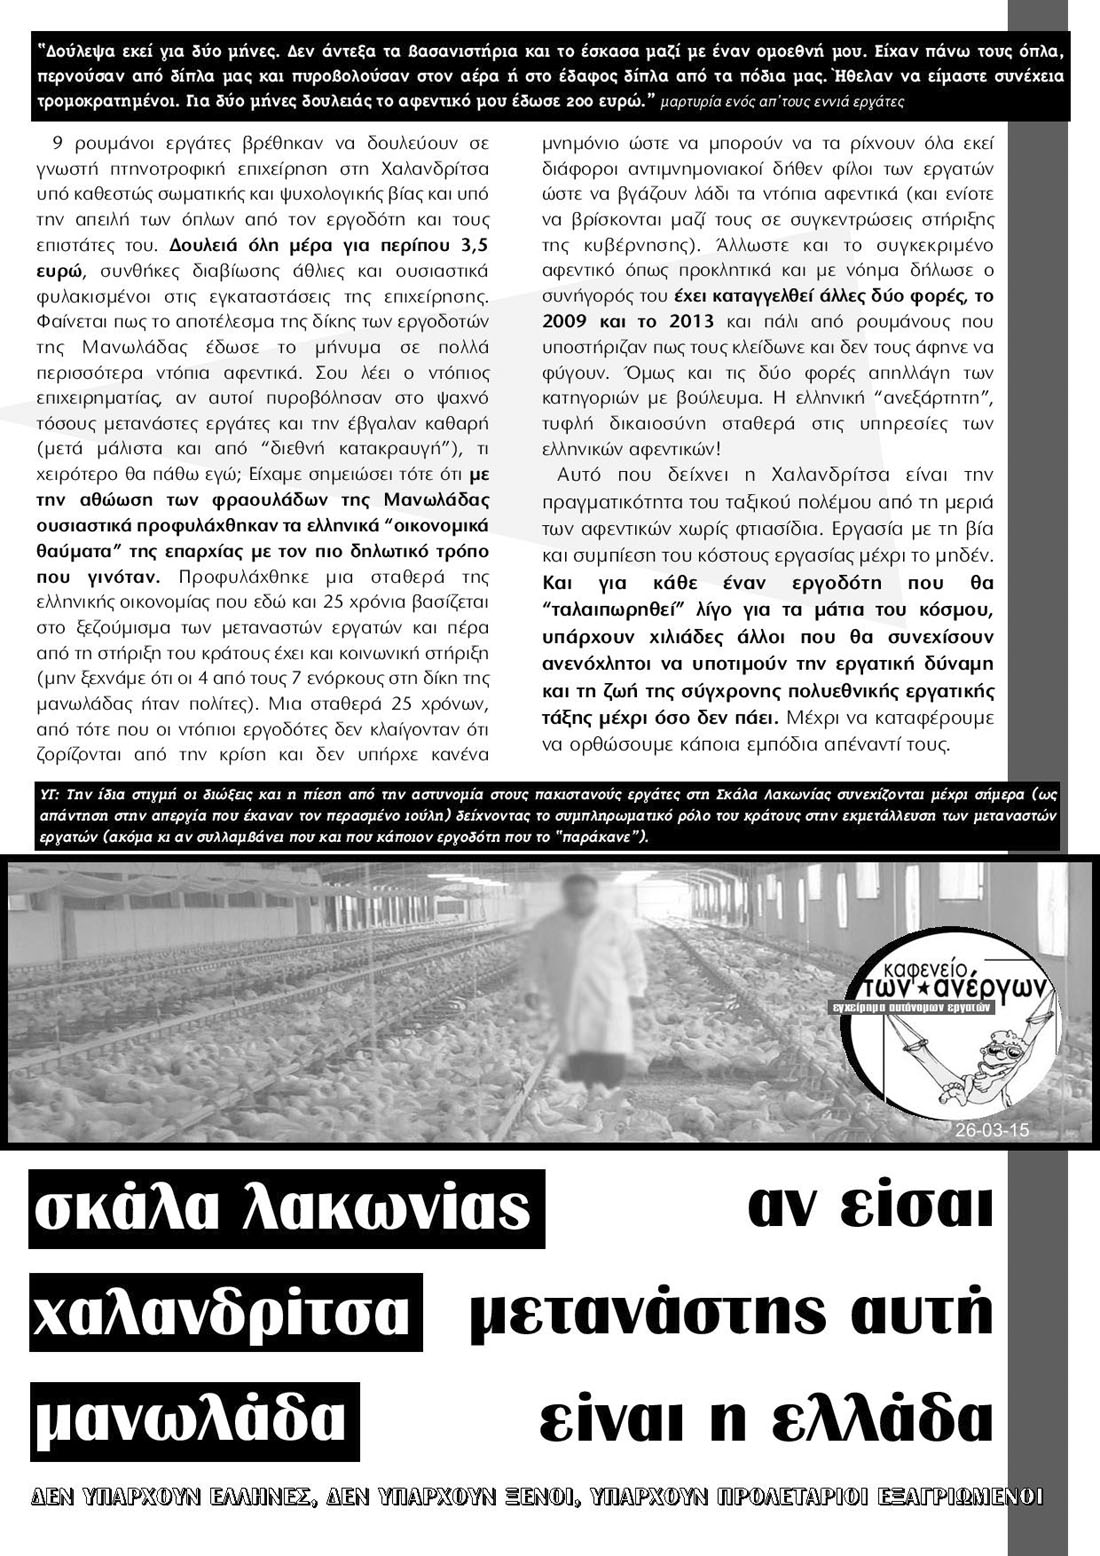 xalandritsat-page-001